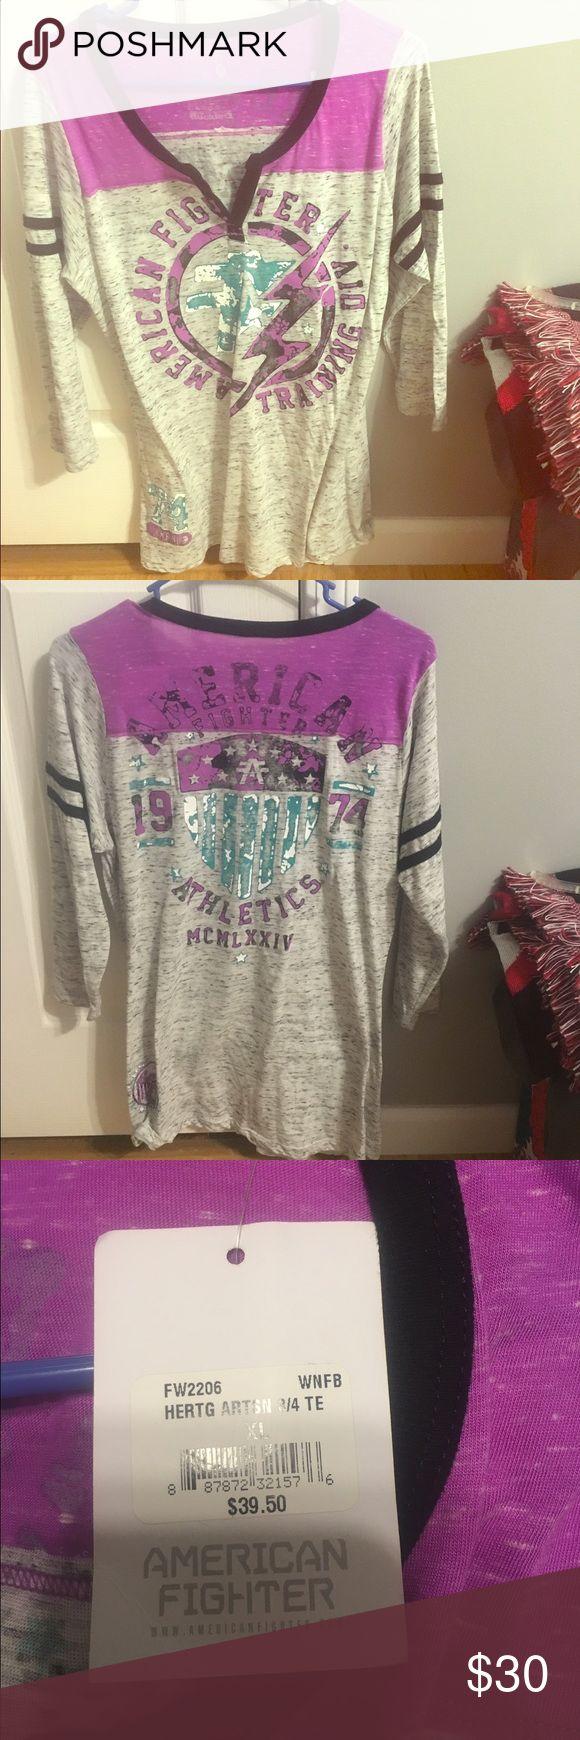 Spotted while shopping on Poshmark: Women's American Fighter shirt! #poshmark…